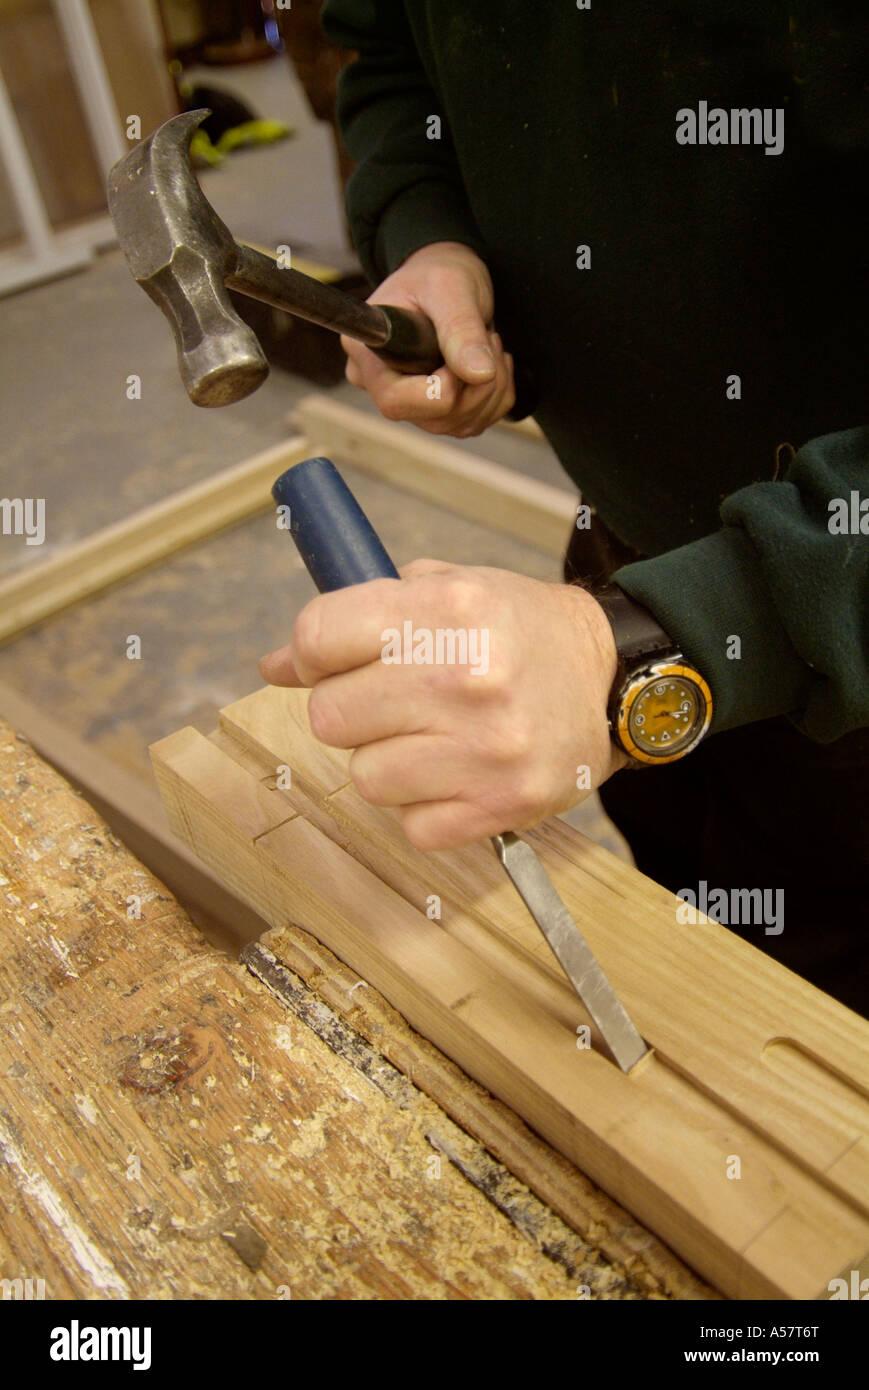 Remarkable Hammer Chisel Woodwork Workshop Craftsman Joiner Vice Clamp Pdpeps Interior Chair Design Pdpepsorg